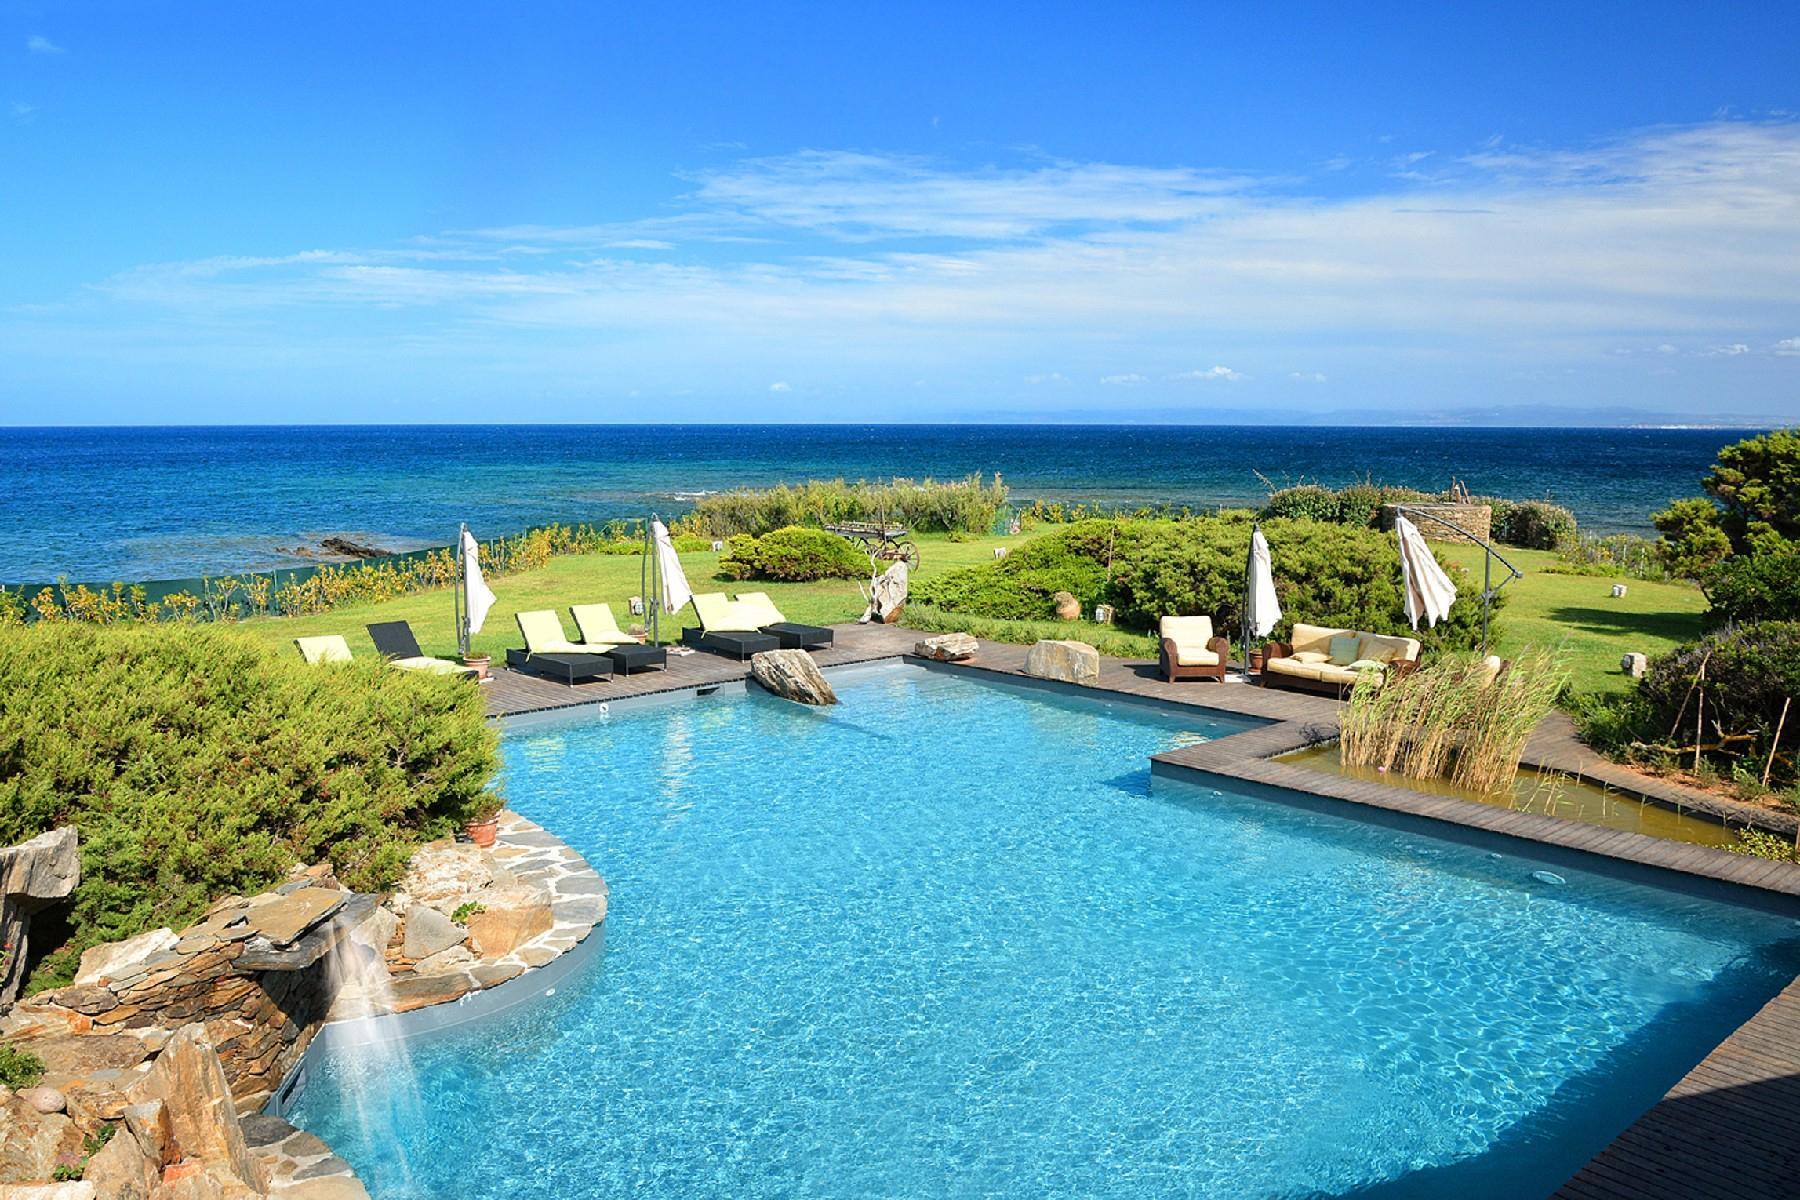 Pieds-dans-l'eau Villa auf einer privaten Halbinsel - 1